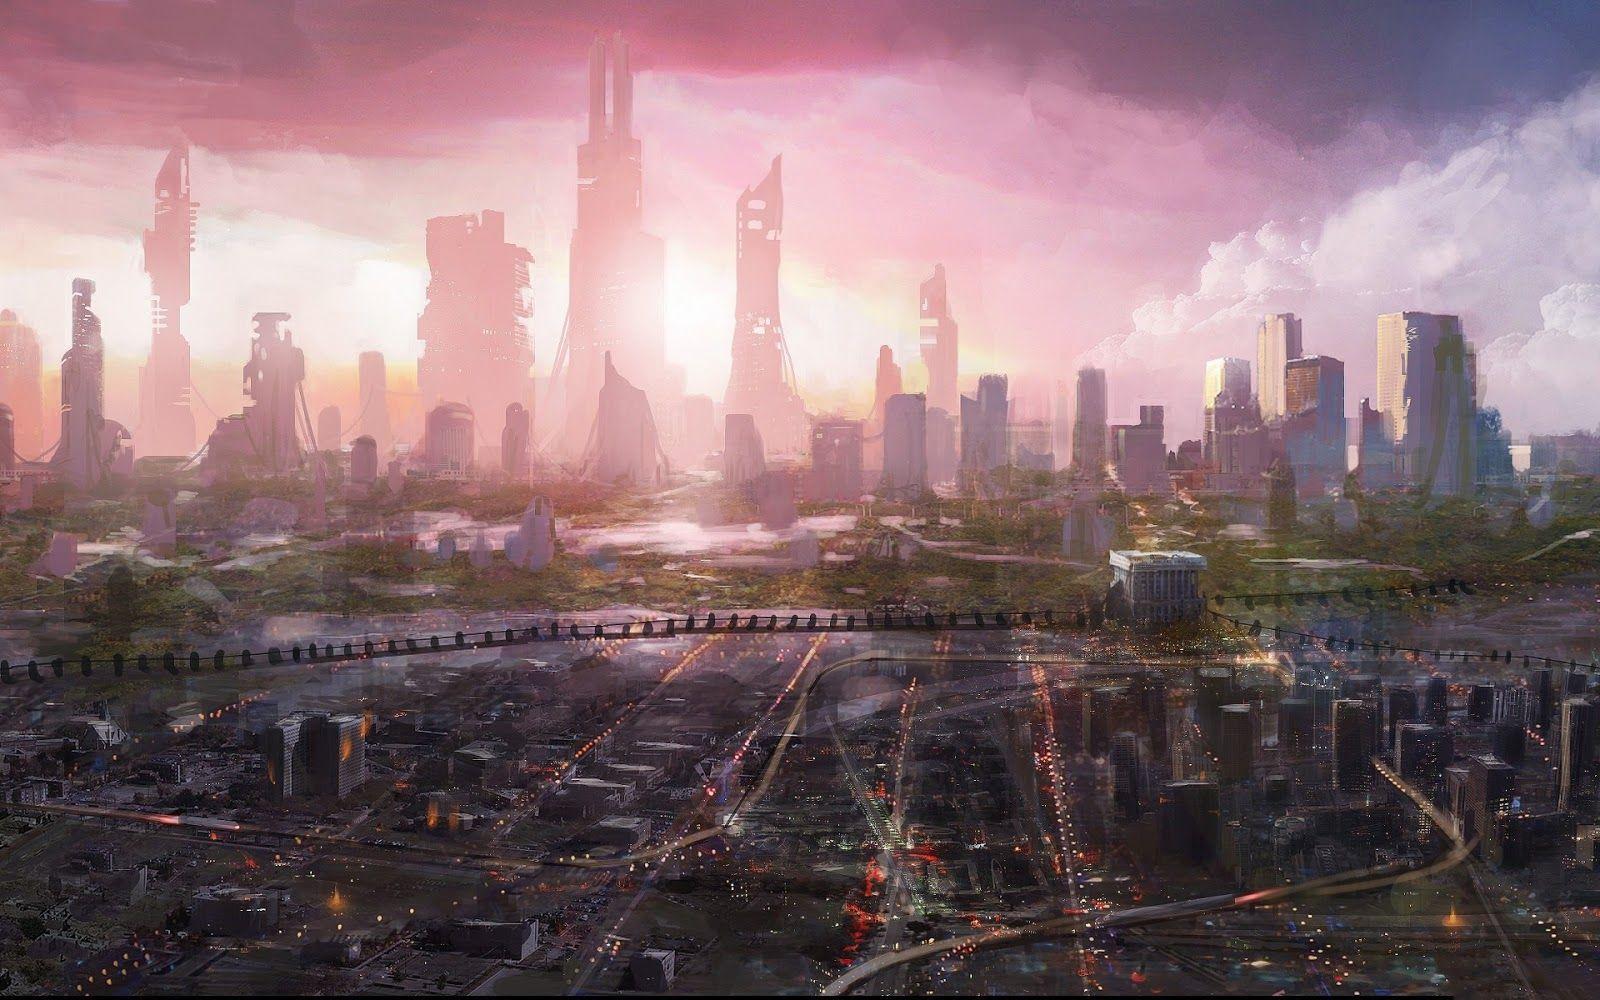 Futuristic City Conceptart Concept Photography Sketches Scifi Steampunk Steam Punk Purse Fashion Yolo Bonetech Steampunk City Futuristic City Fantasy Landscape